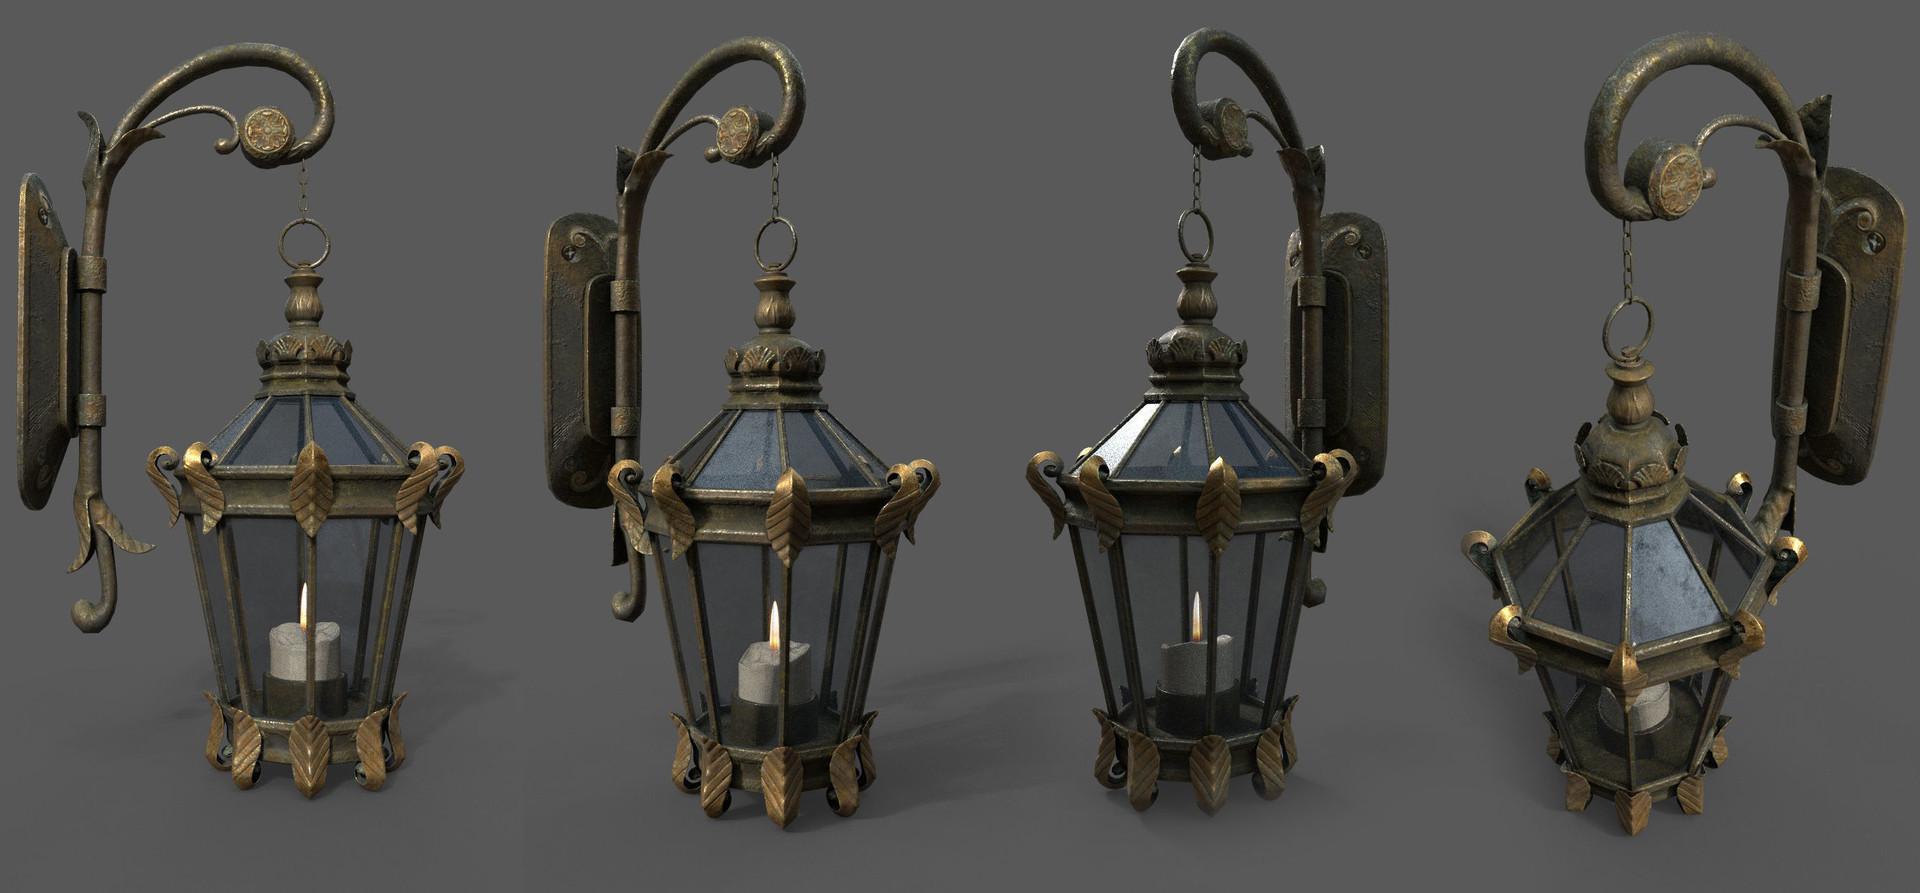 Mustafa arifoglu lantern